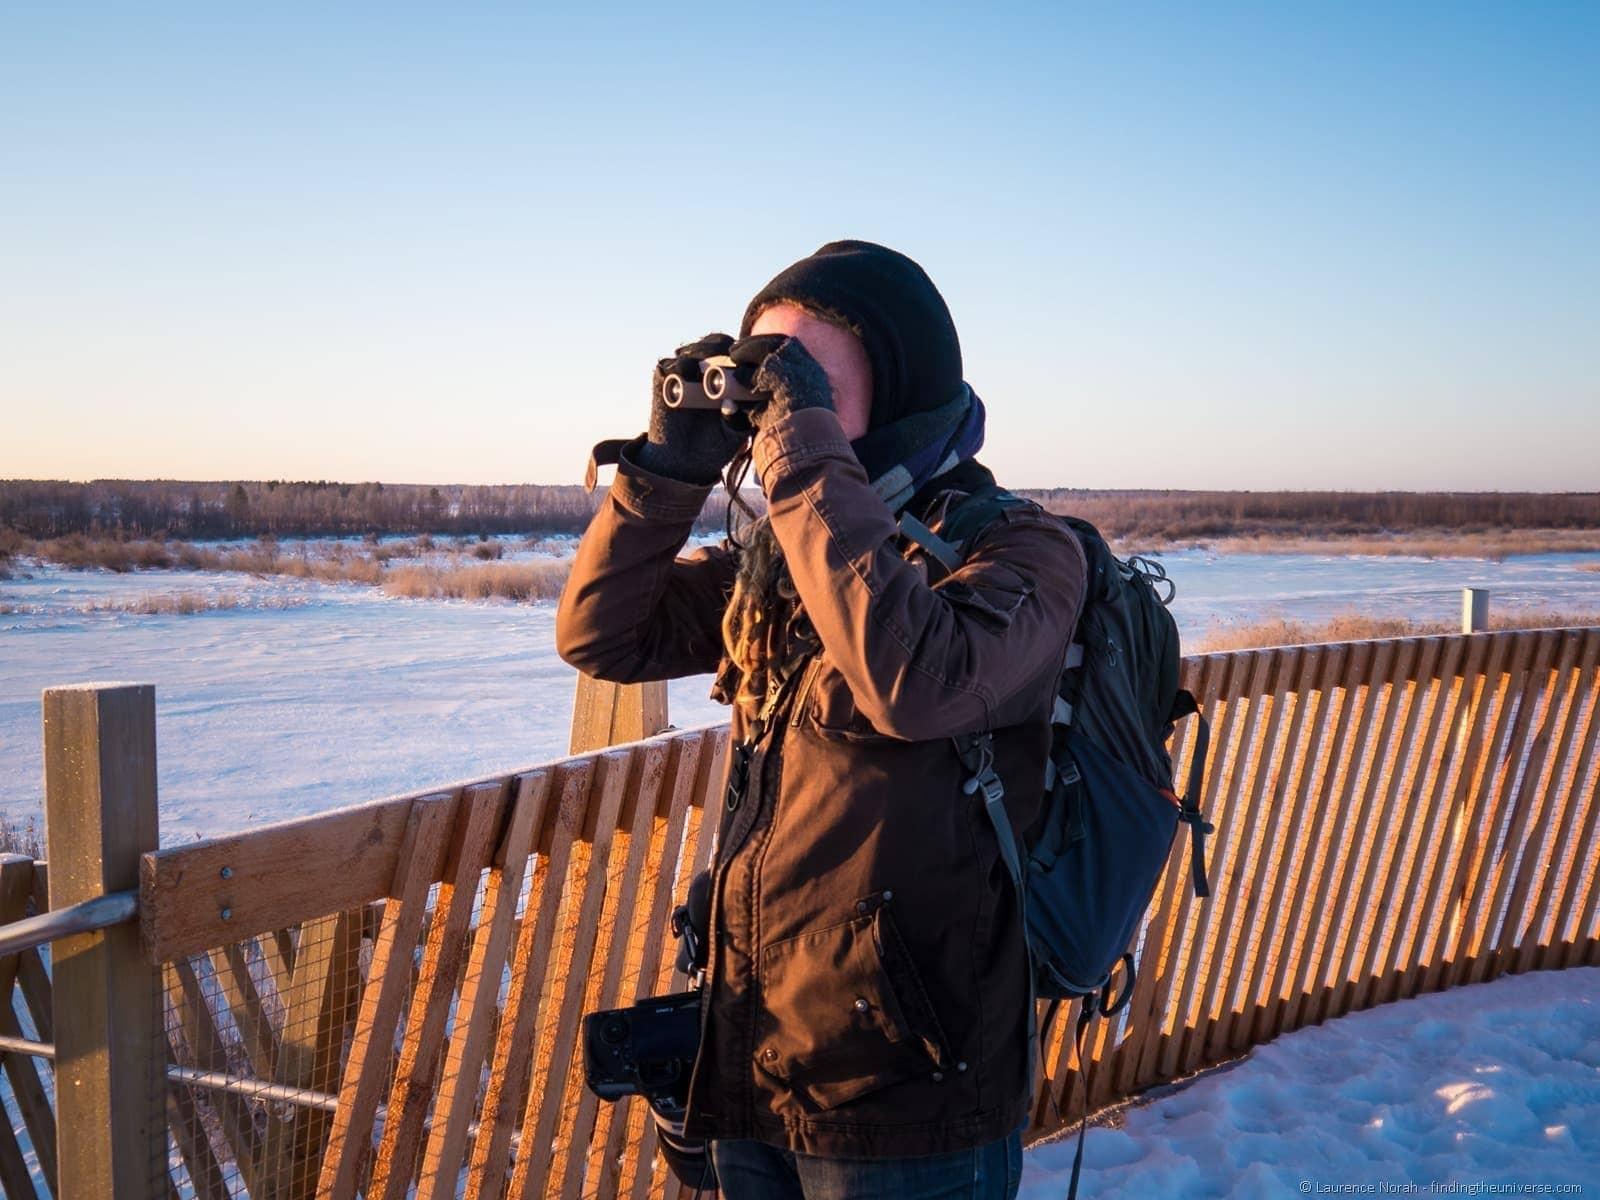 swarovski cl pocket binoculars review 2